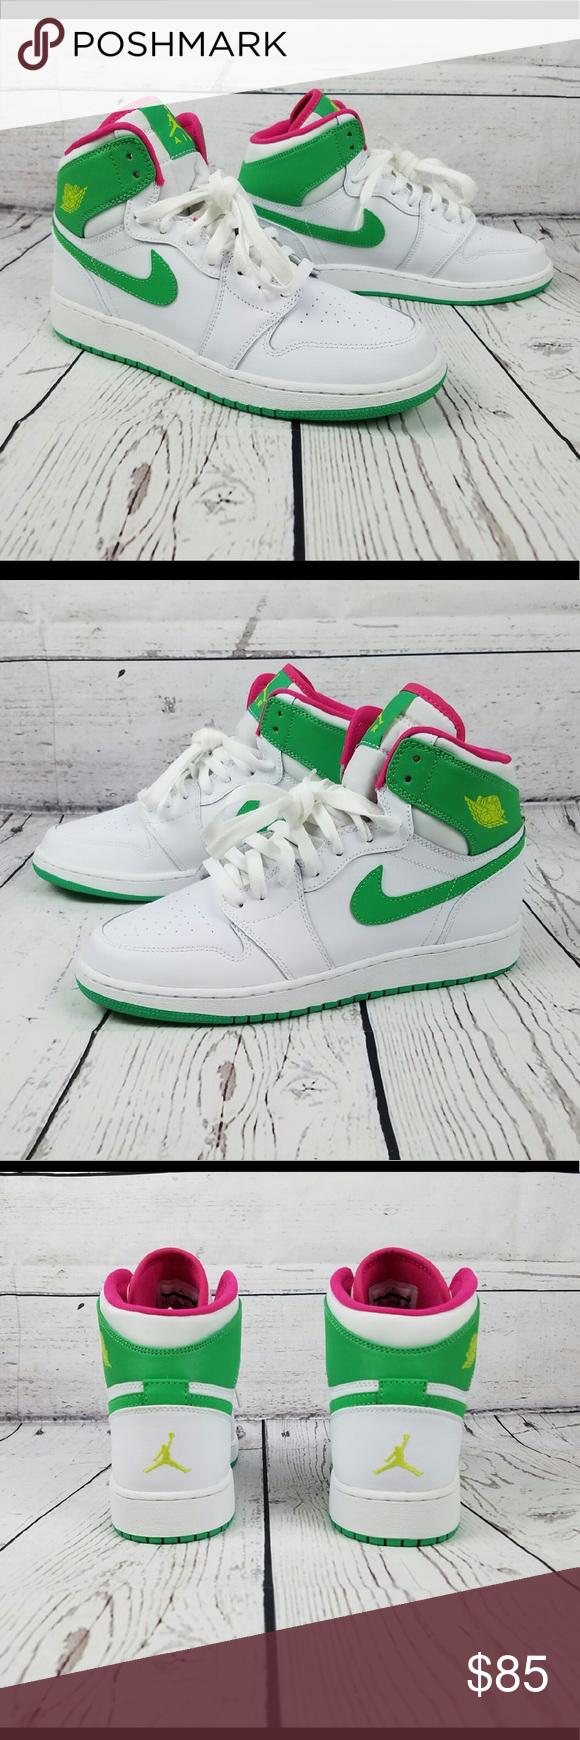 sports shoes bddc7 3fdb2 Air Jordan 1 Retro High GG NEW! White Gamma Green-VVD Pink 8Y   9.5 Womens  Never worn Nike Shoes Athletic Shoes